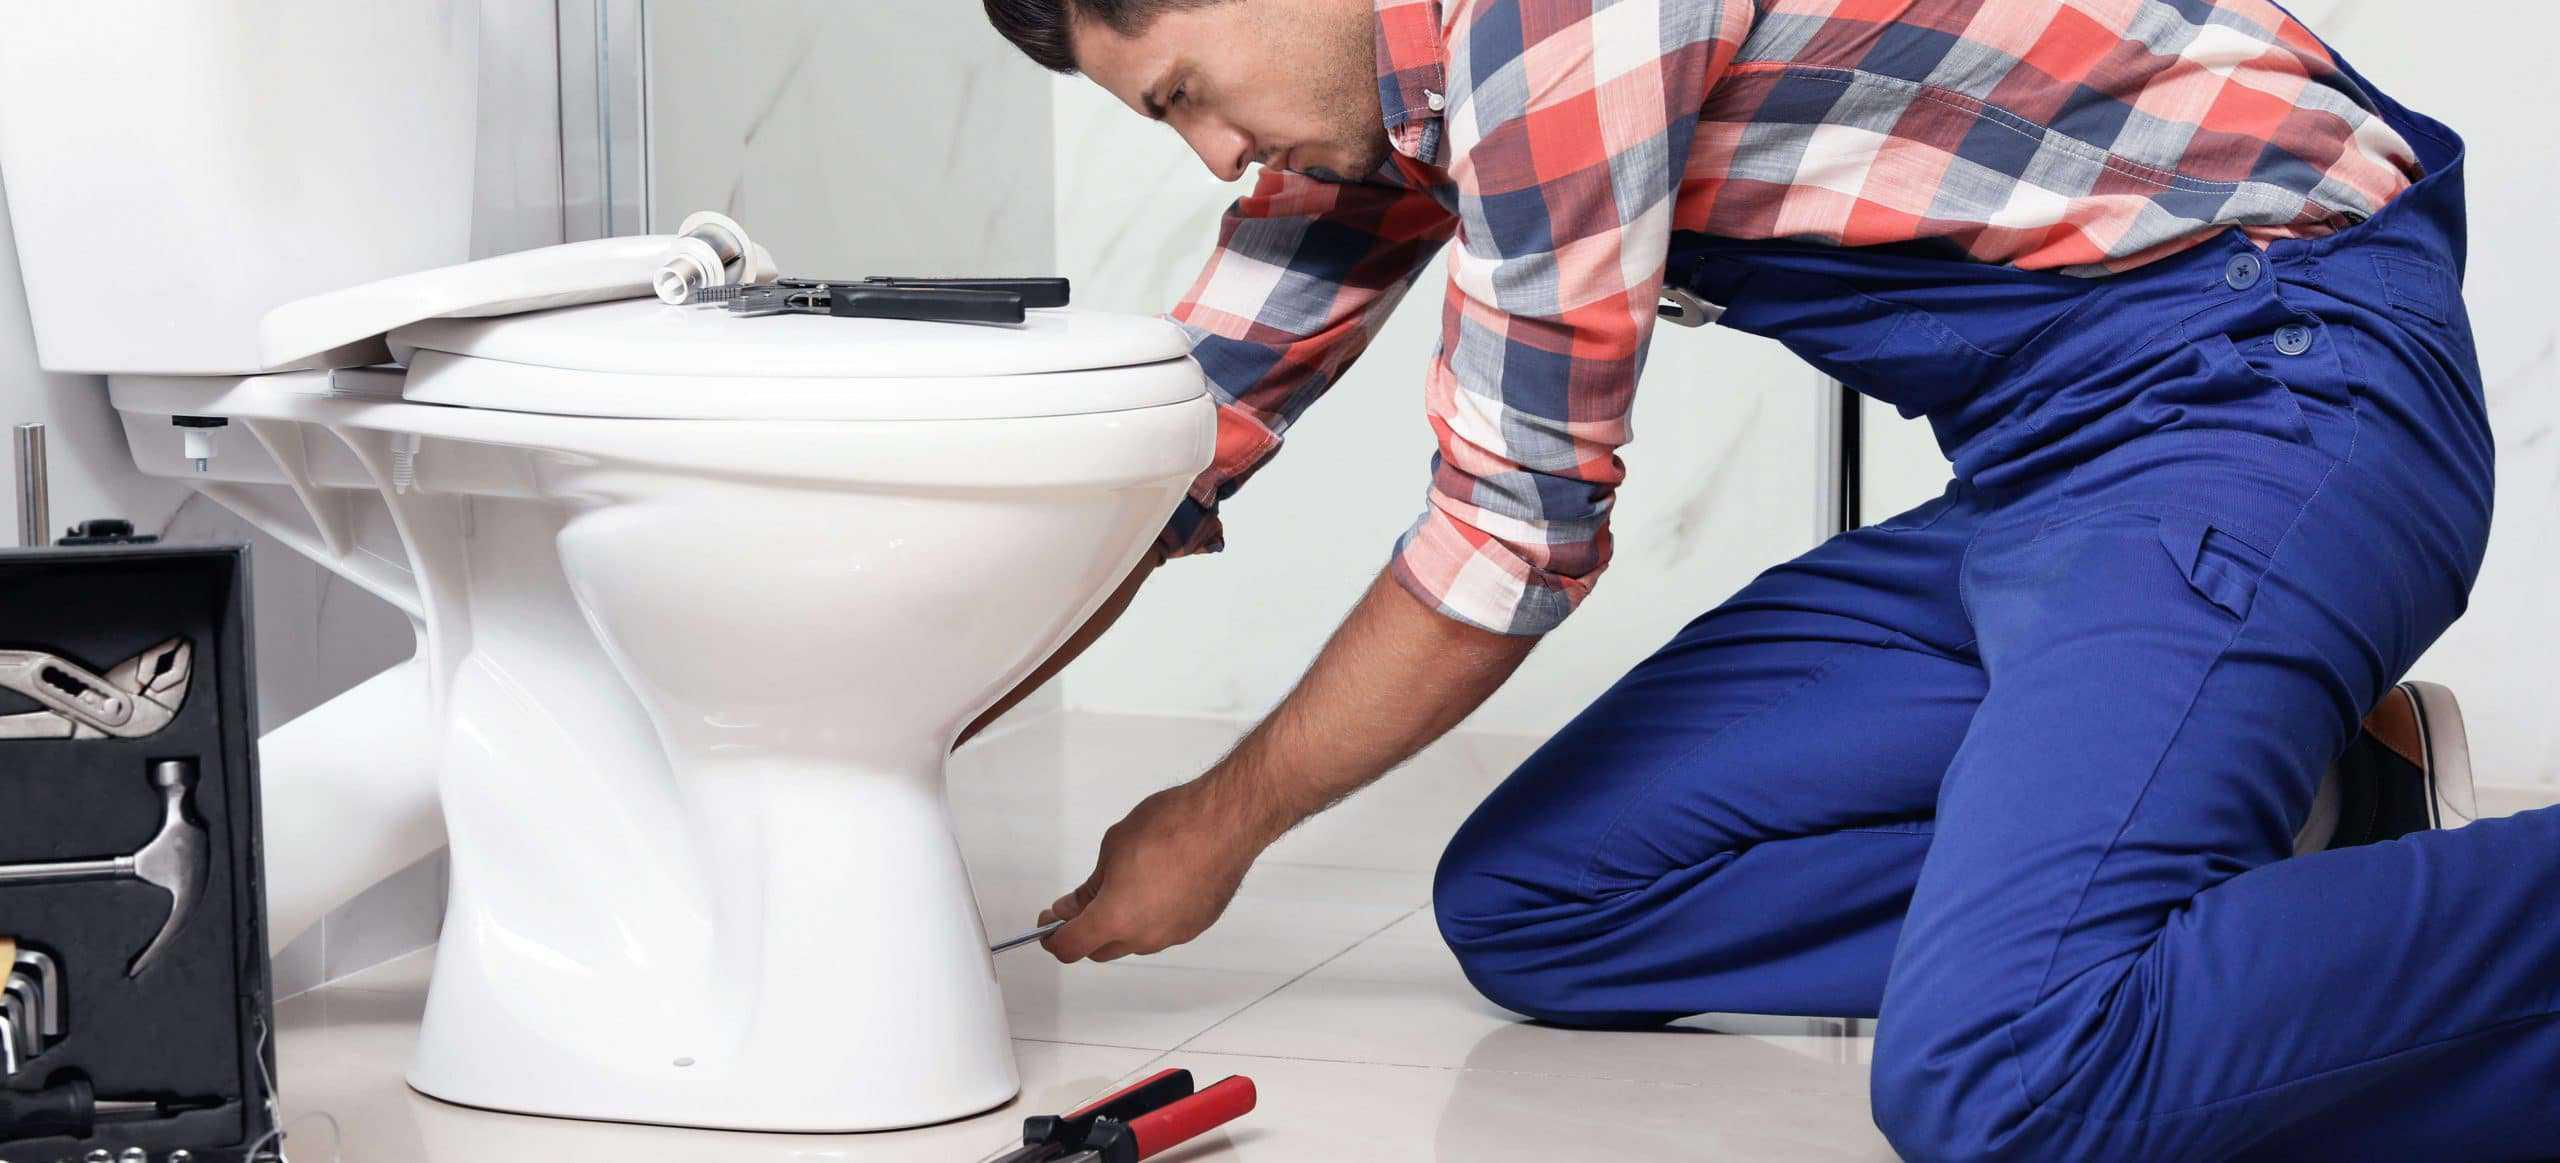 man installing a new toilet